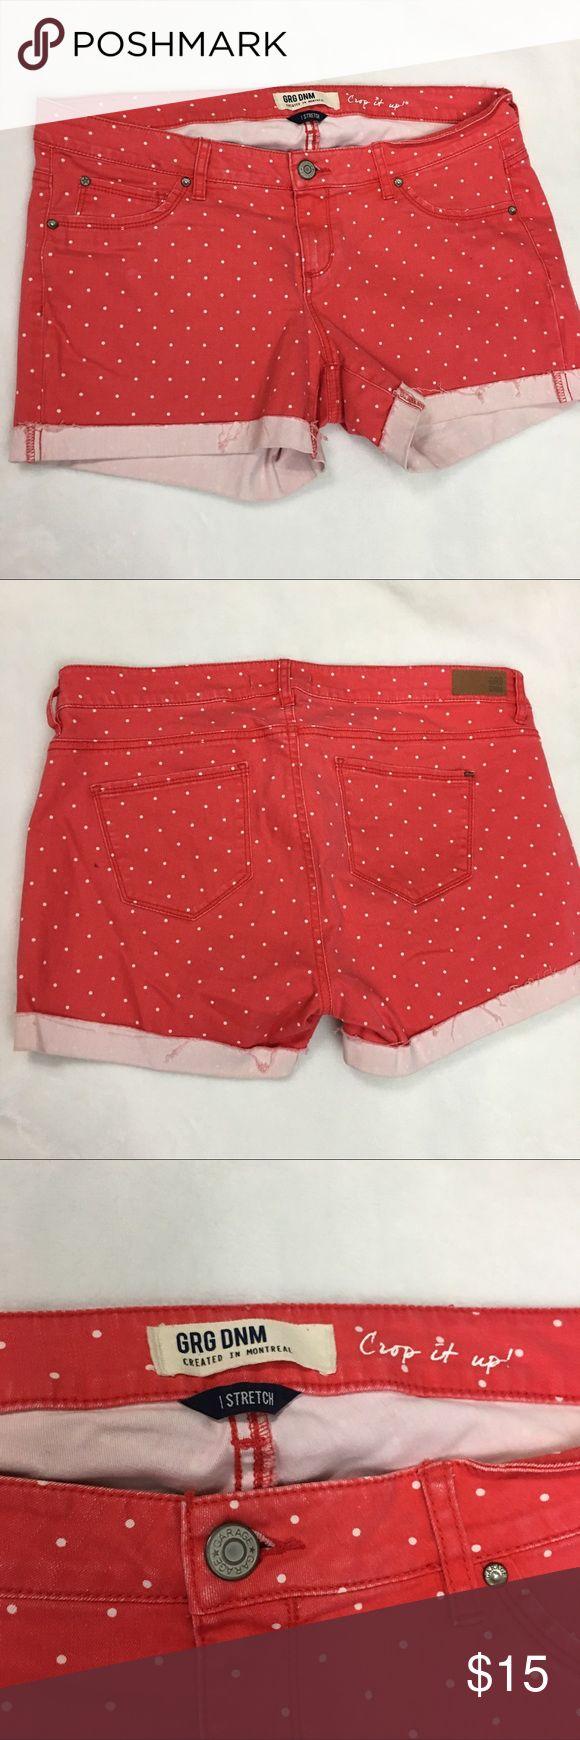 "GRG Denim Coral Polka Dot Stretch Shorts GRG Polka Dot Stretch Shorts Size 13 Cotton Blend in gently used condition with no flaws.  Measurements: Waist: 17.5"" Rise: 8"" Inseam: 4"" GRG Denim  Shorts Jean Shorts"